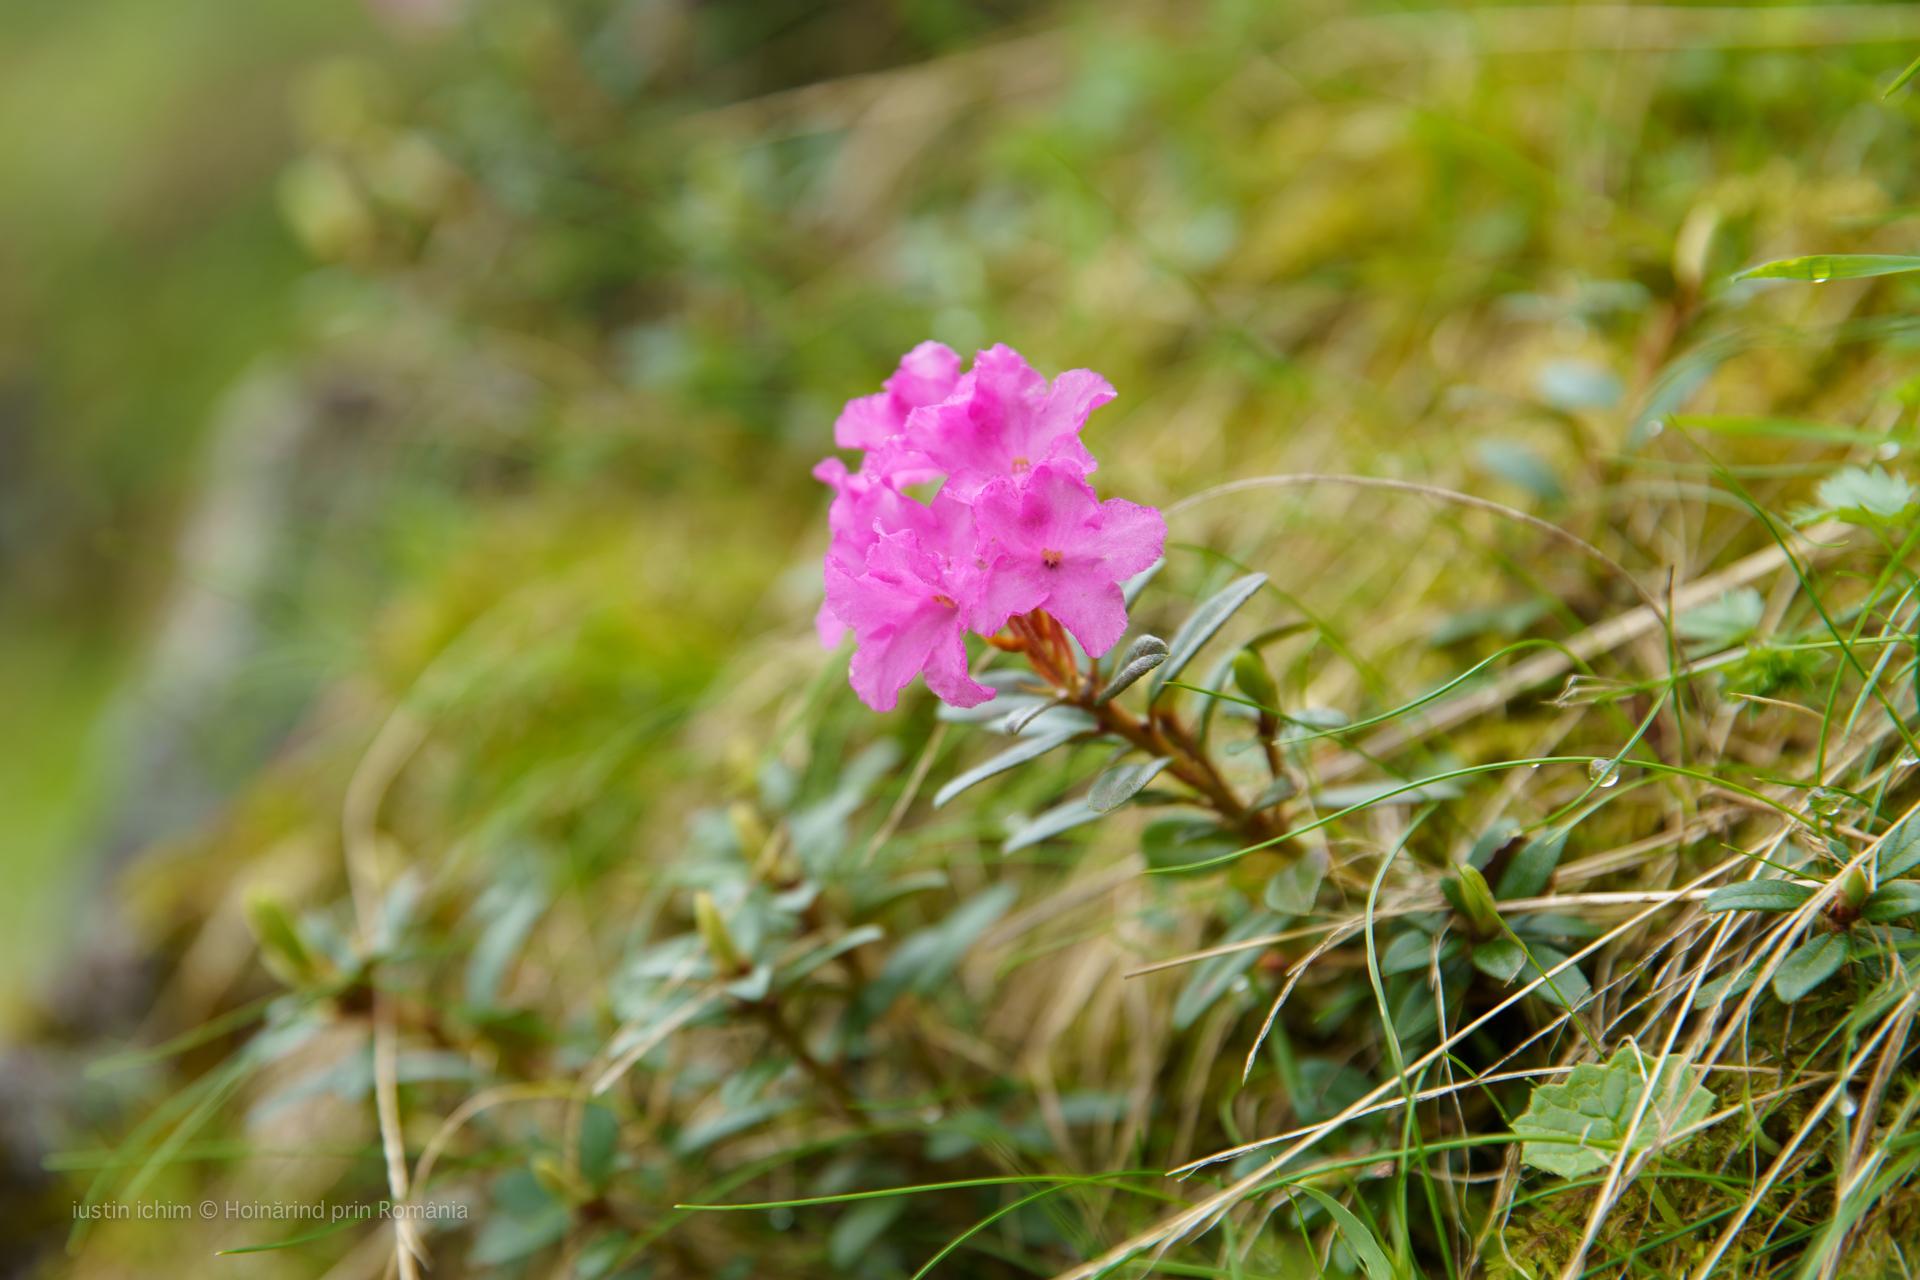 Rhododendron L., Trandafir de munte, Bujor de munte, Azalee in Munții Făgăraș